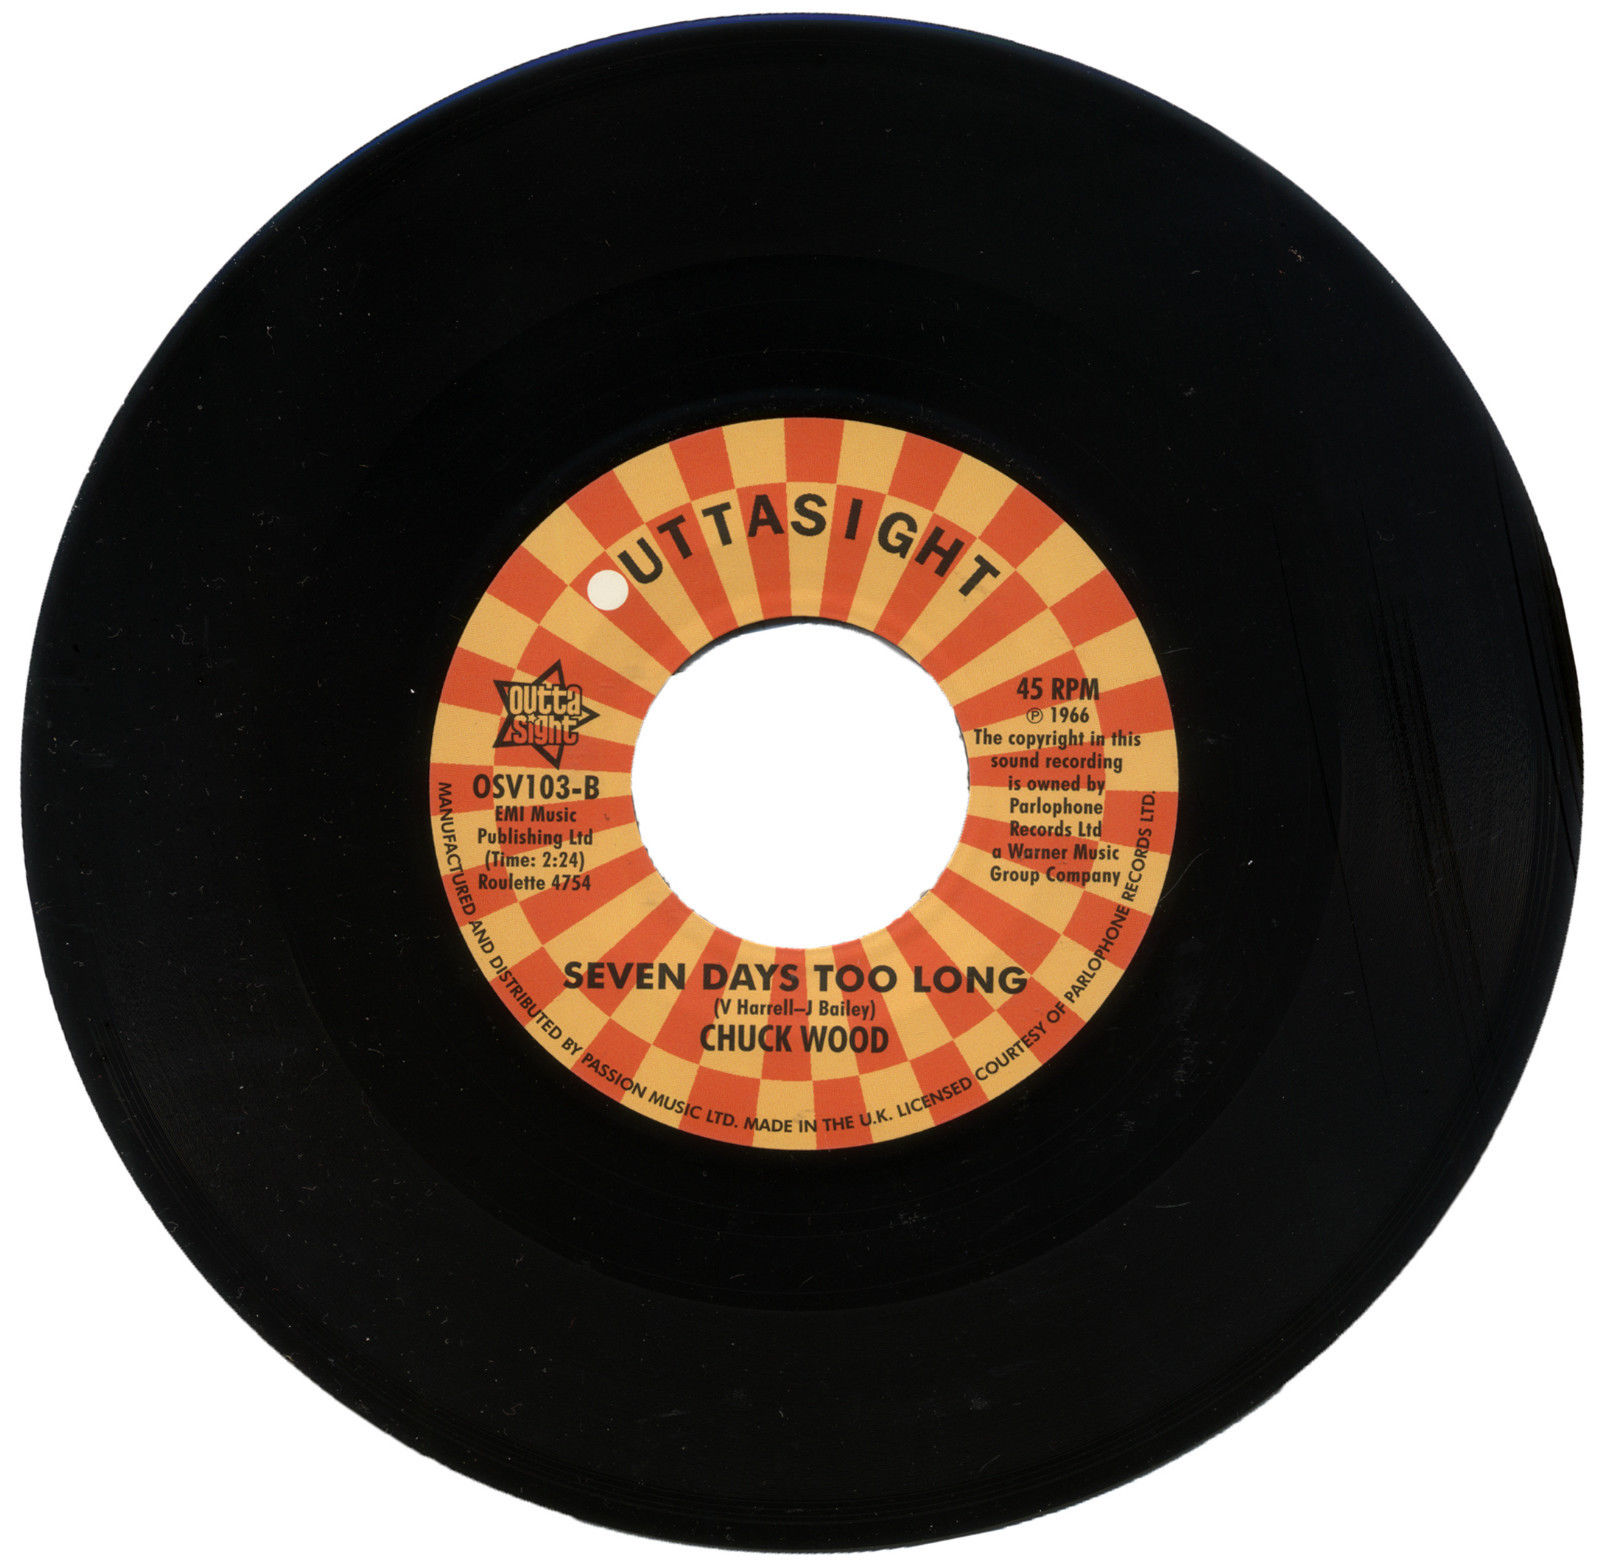 Casualeers – Dance Dance Dance / Chuck Wood – Seven Days Too Long 45 (Outta Sight) 7″ Vinyl